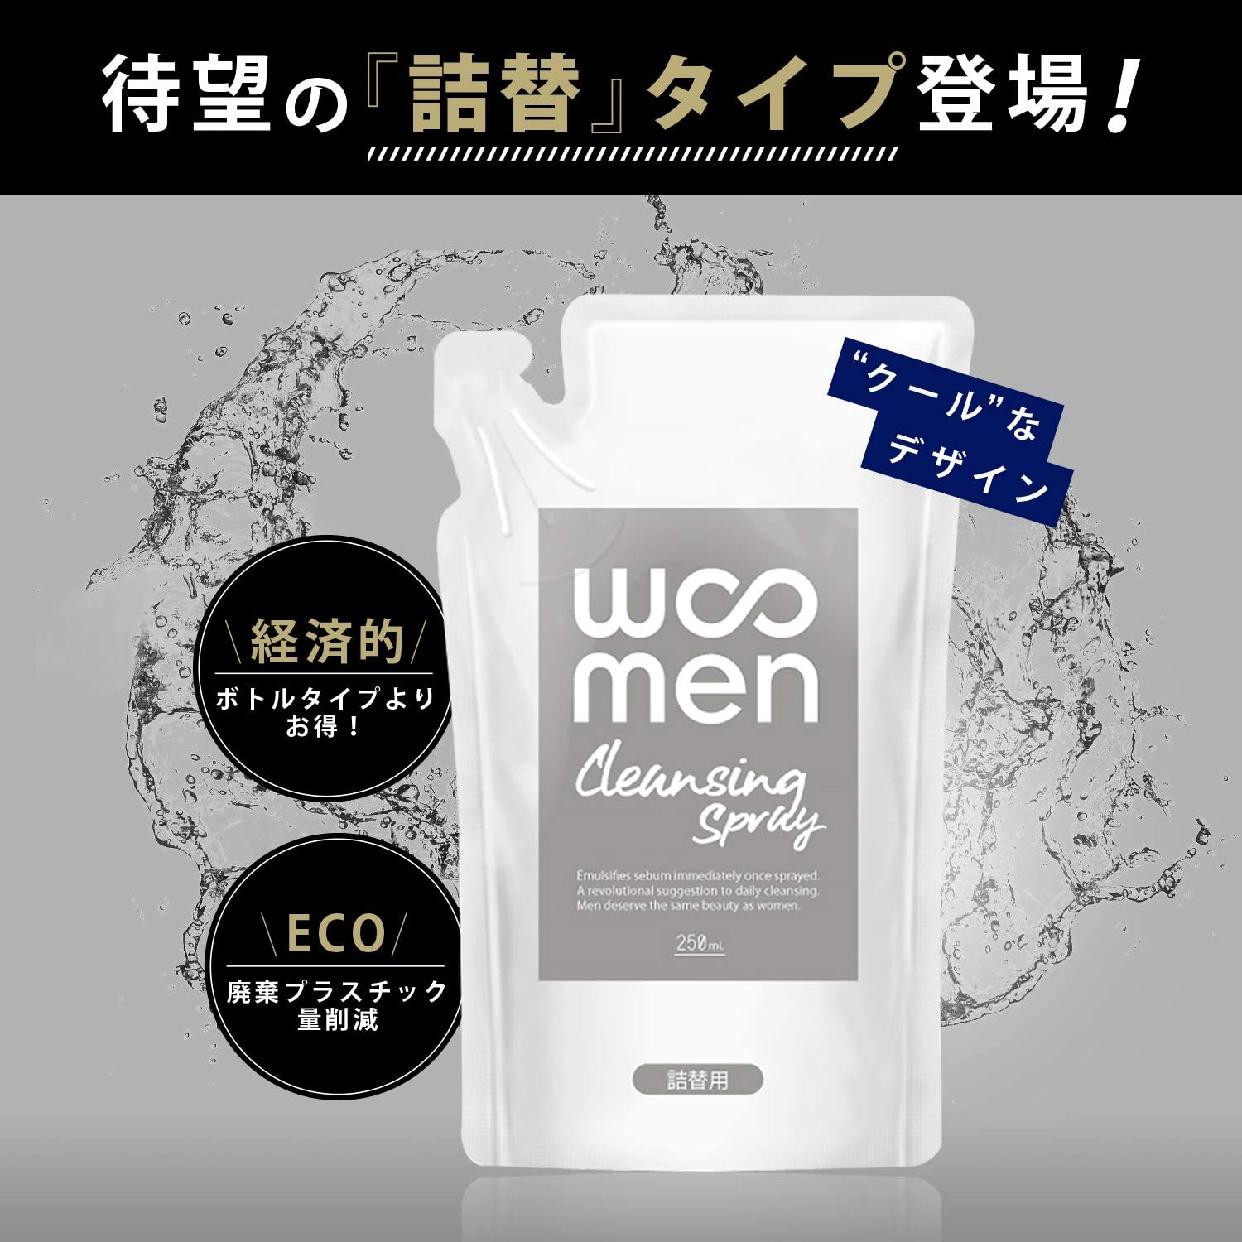 WOOMEN(ウーメン) クレンジングスプレーの商品画像3